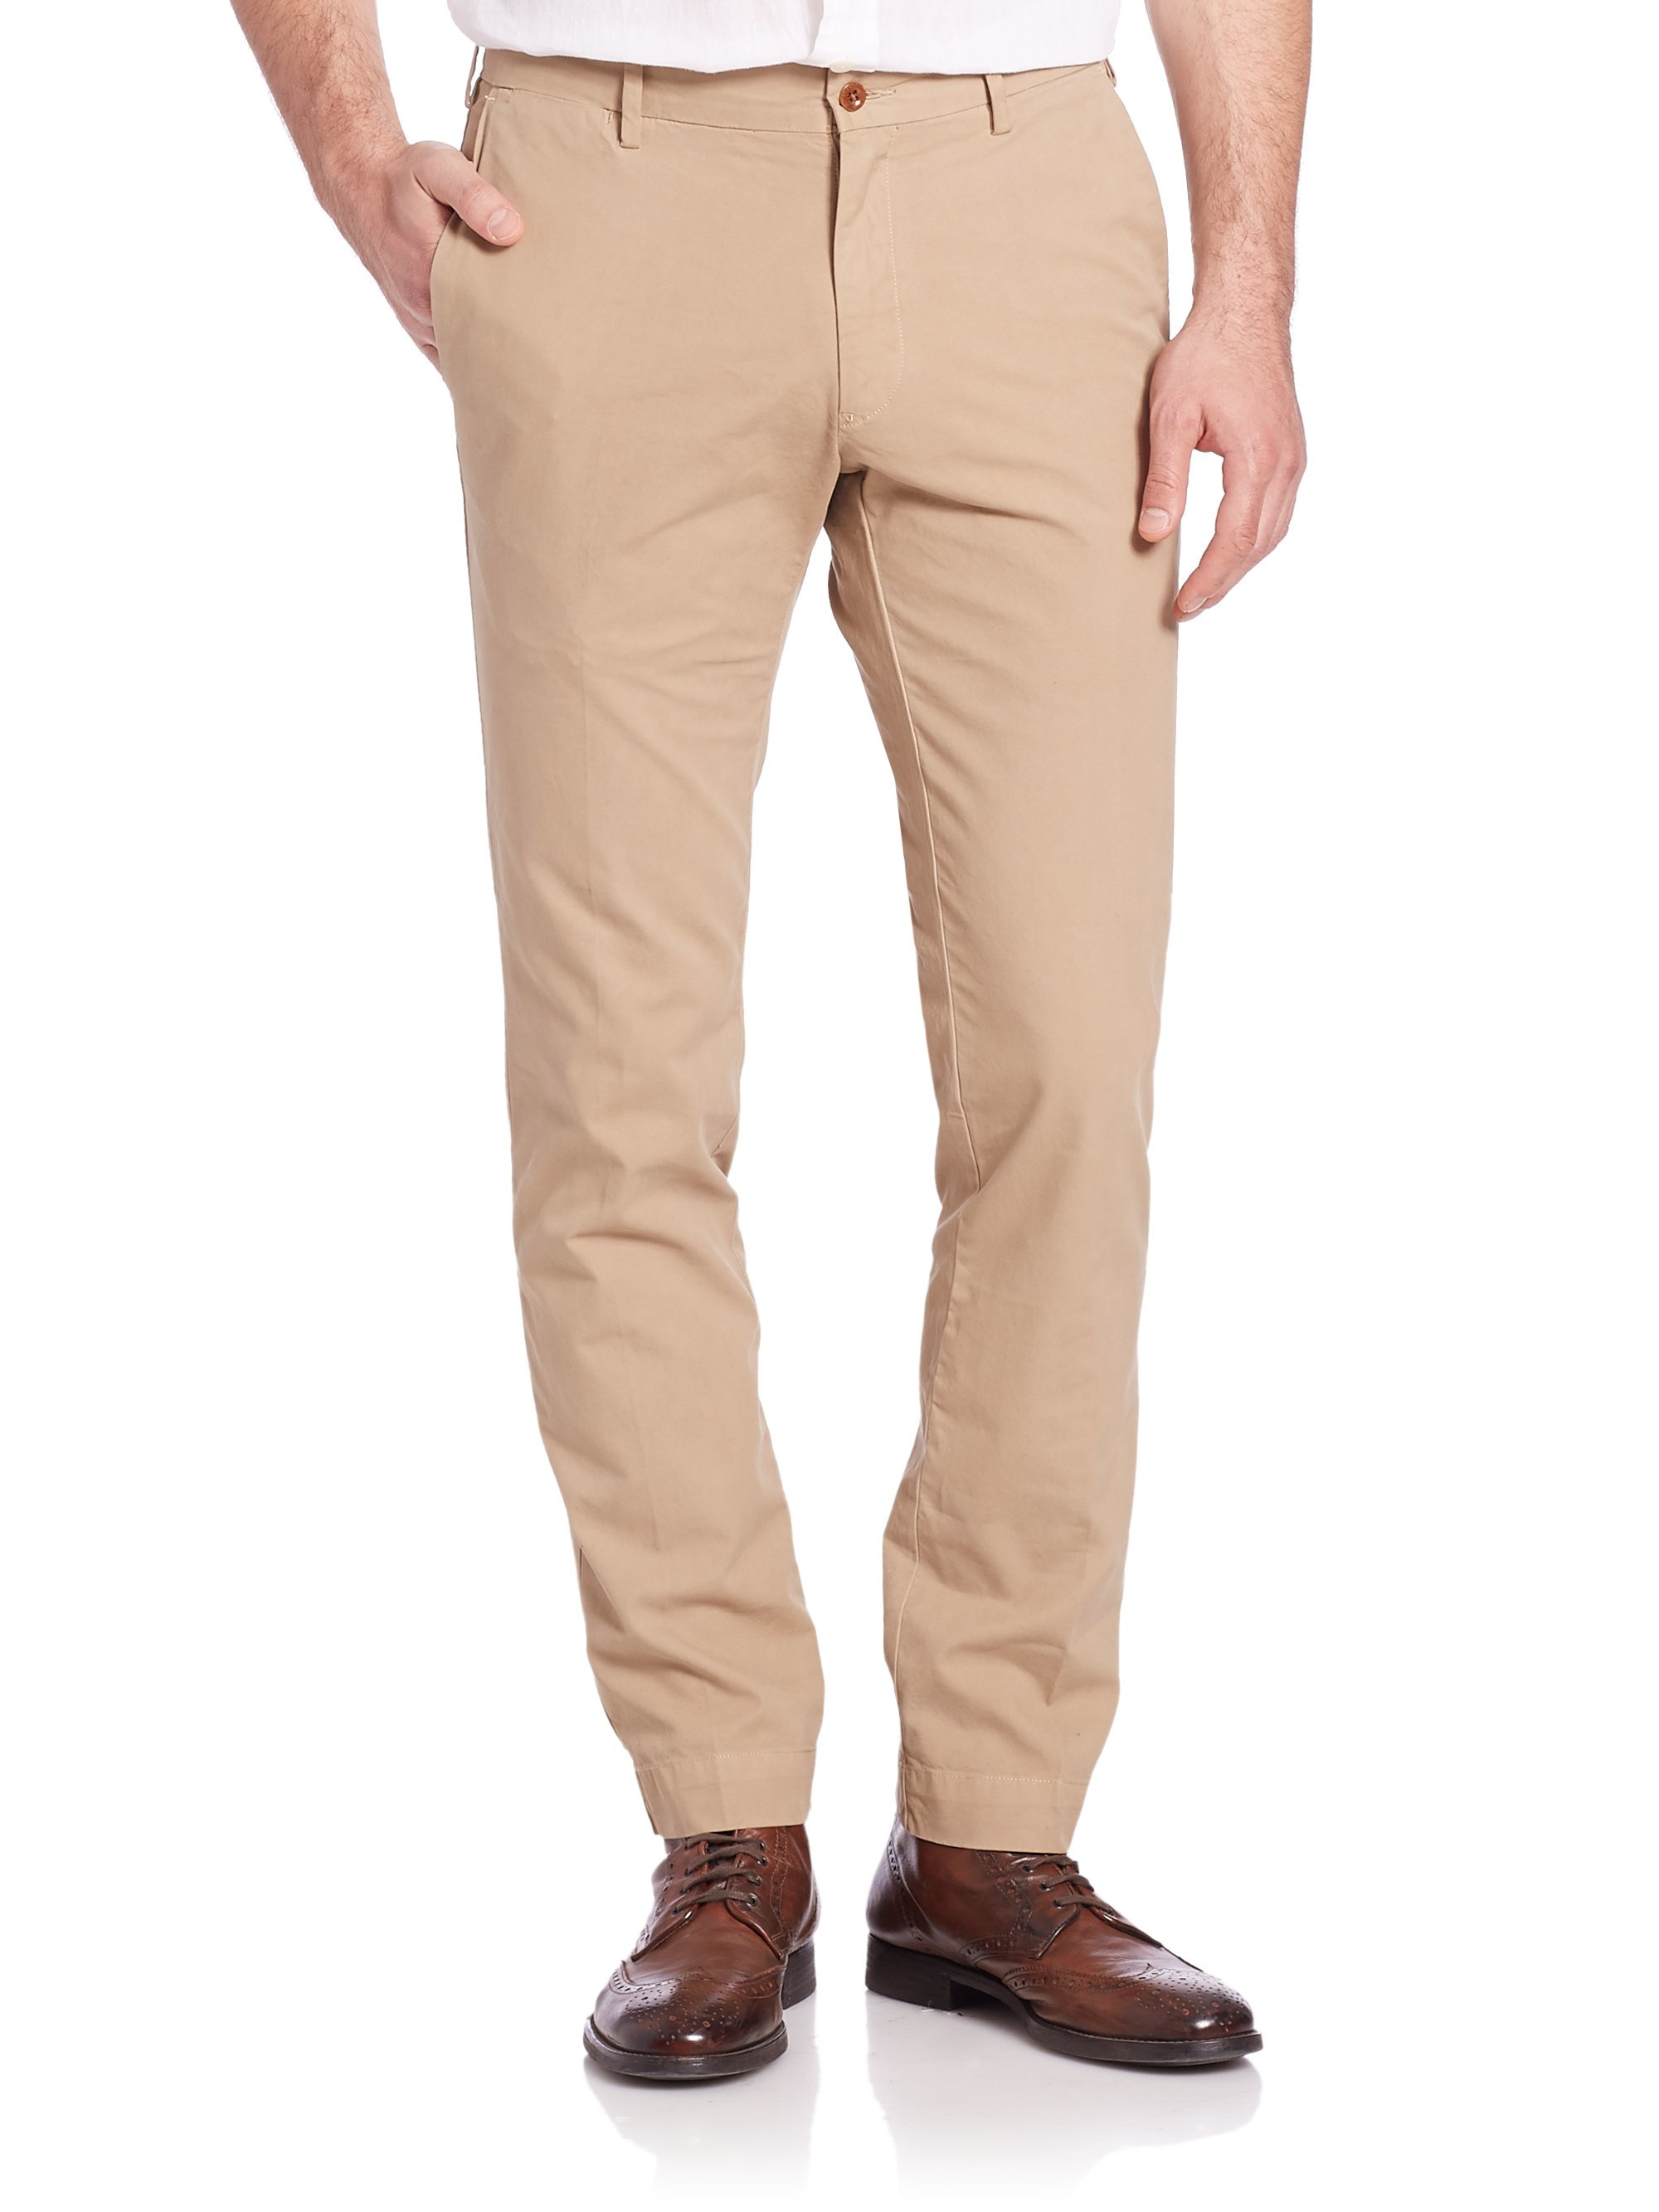 c8ad4b790 Polo Ralph Lauren Slim-fit Newport Pants in Natural for Men - Lyst